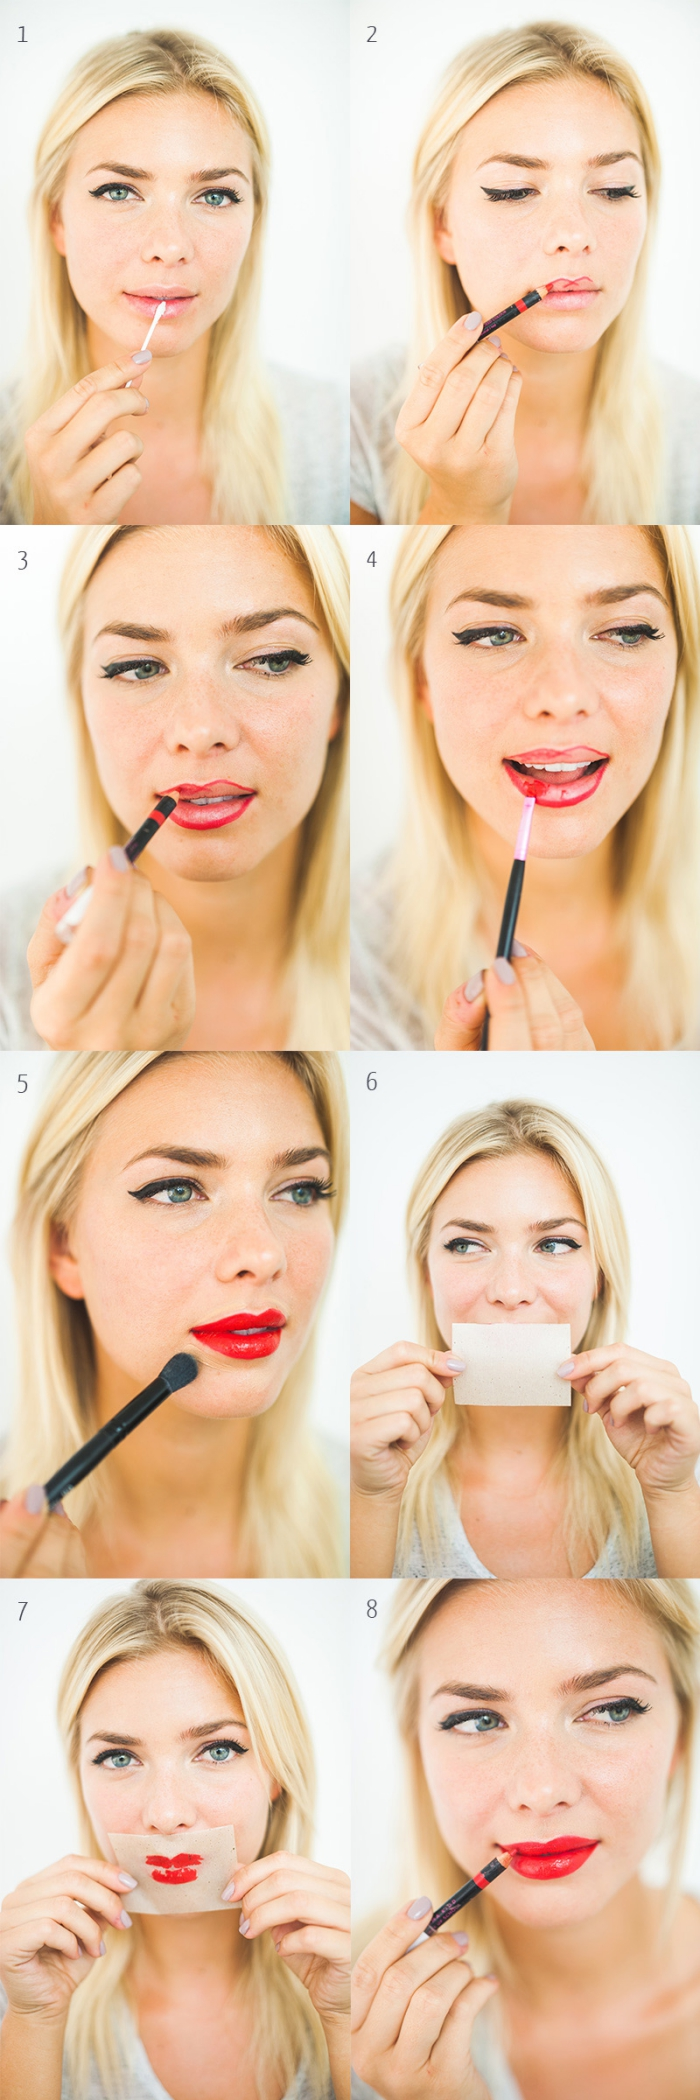 kussechter lippenstift selber schminken rote lippen langfristige farbe auf den lippen blonde dame rote lippenschminke